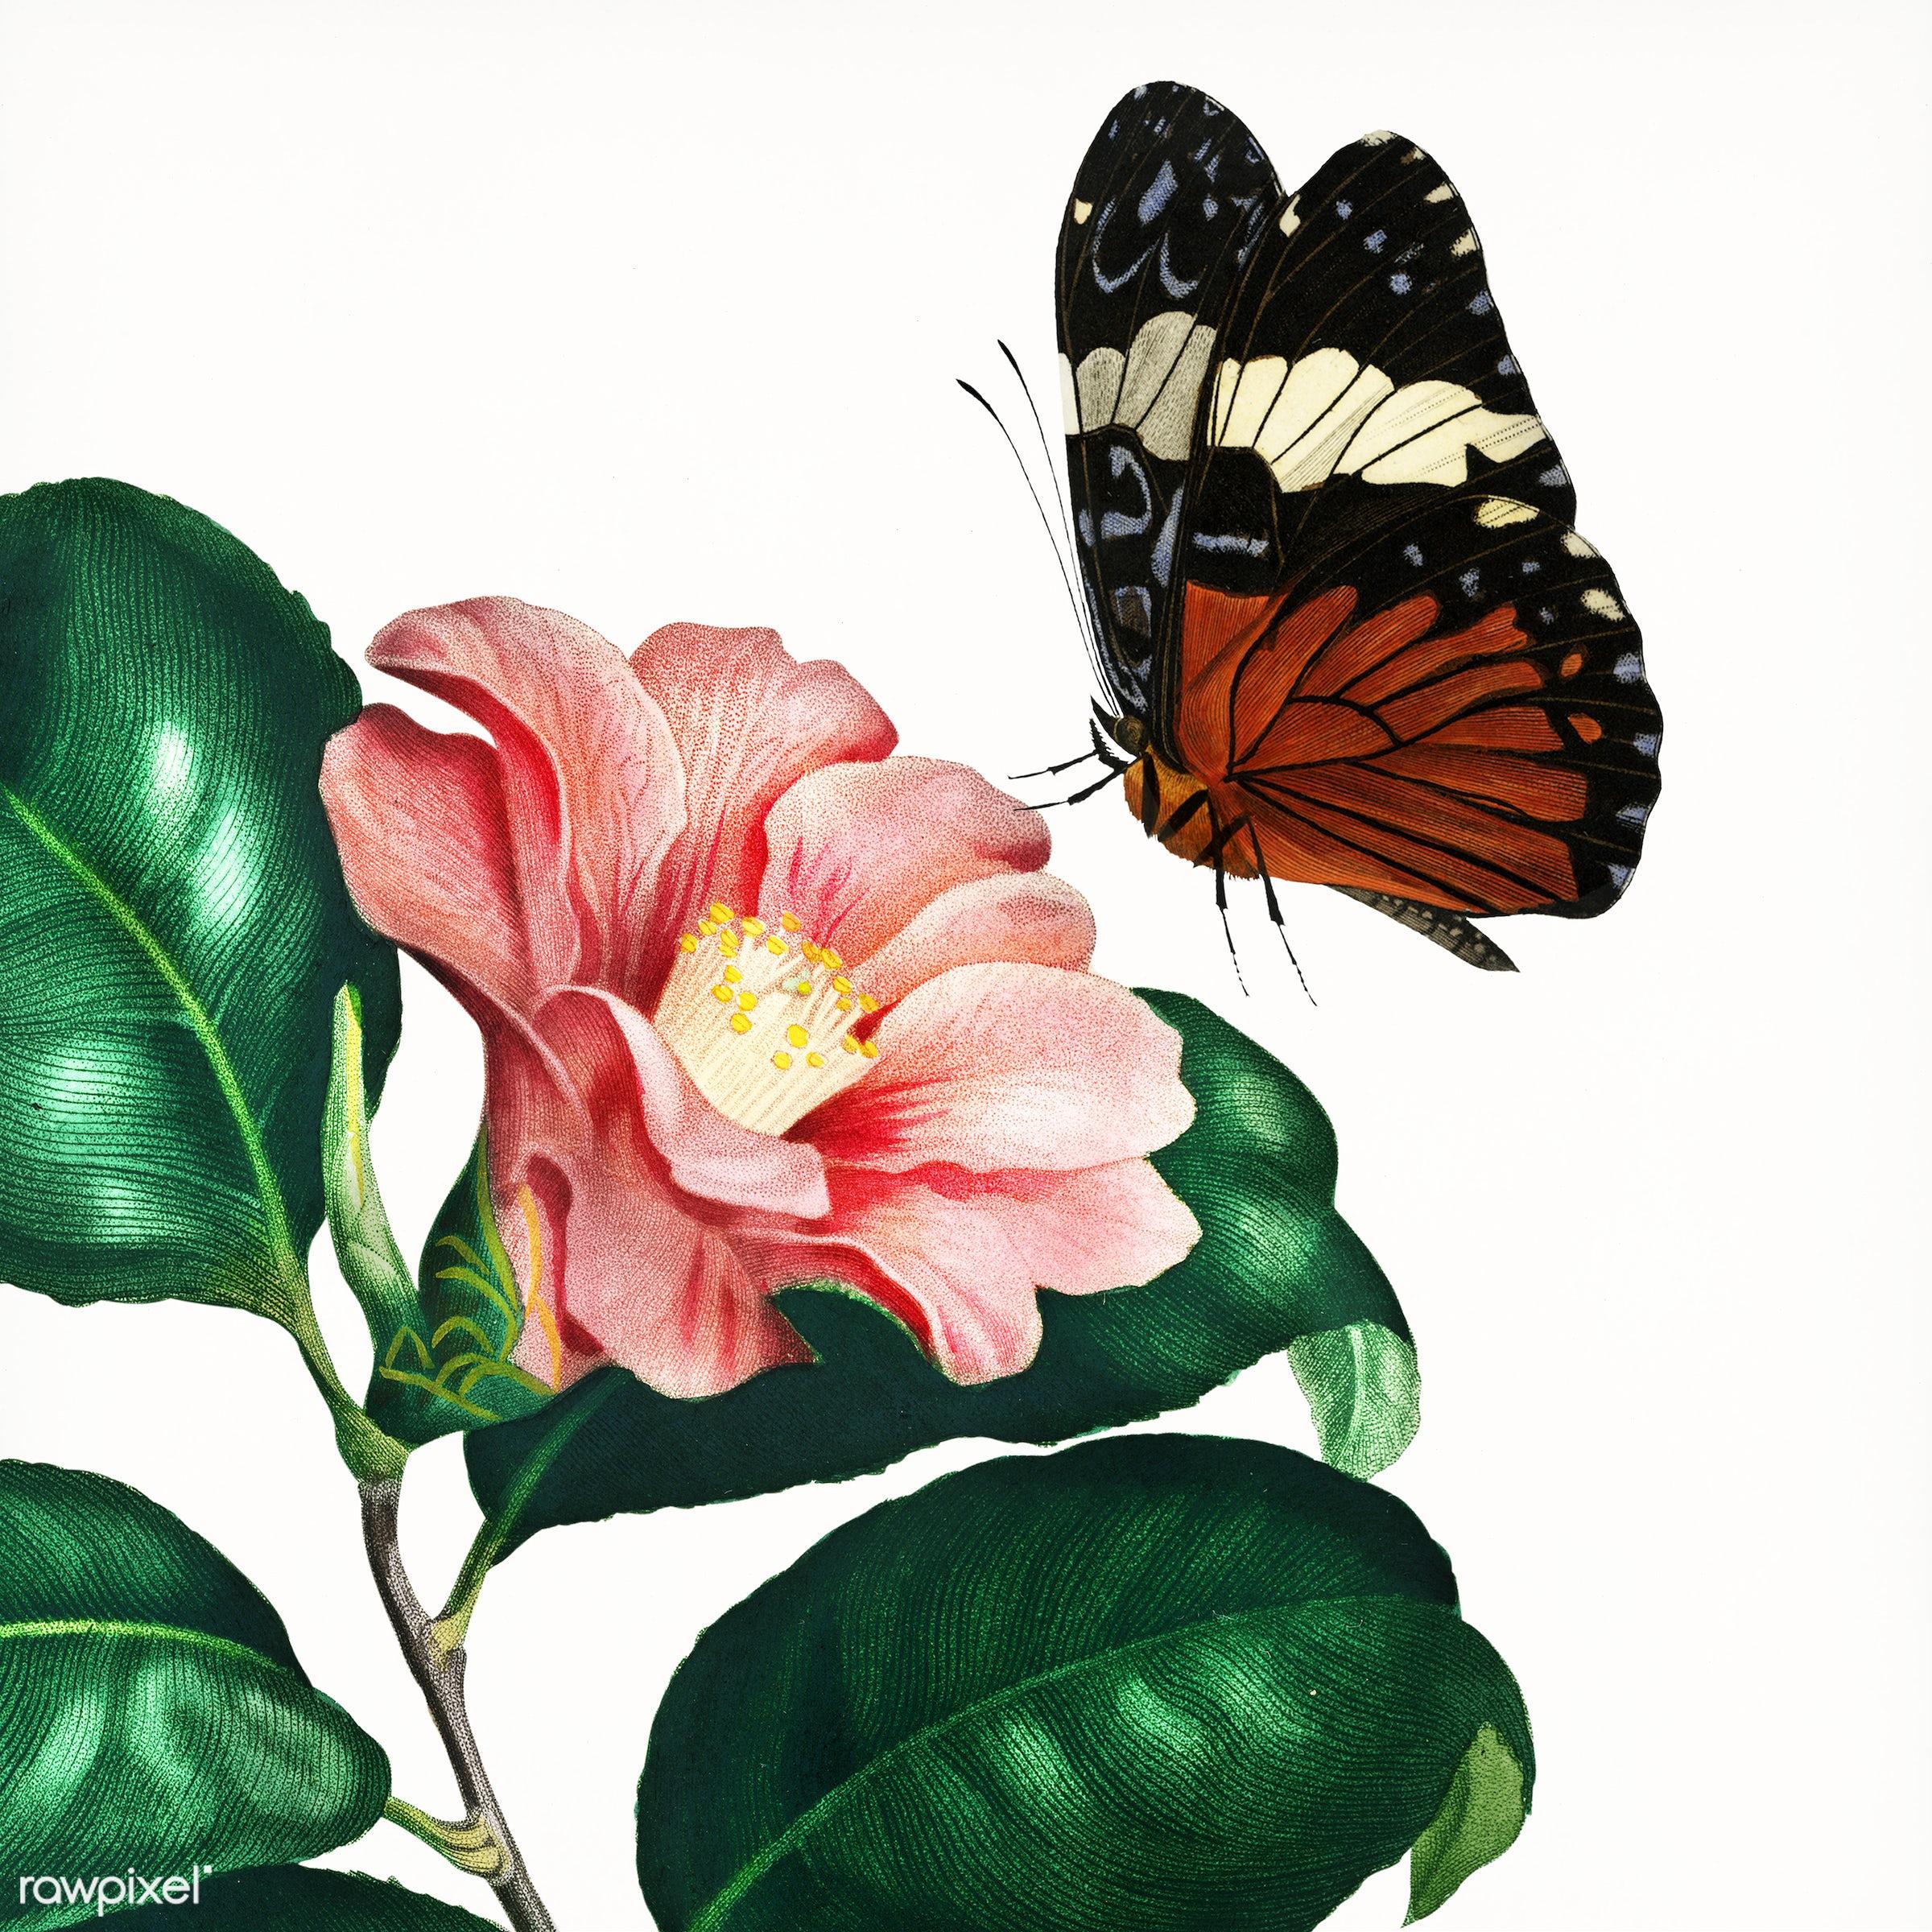 Camellia japonica (Camélia du Japon) illustrated by Charles Dessalines D' Orbigny (1806-1876). Digitally enhanced...